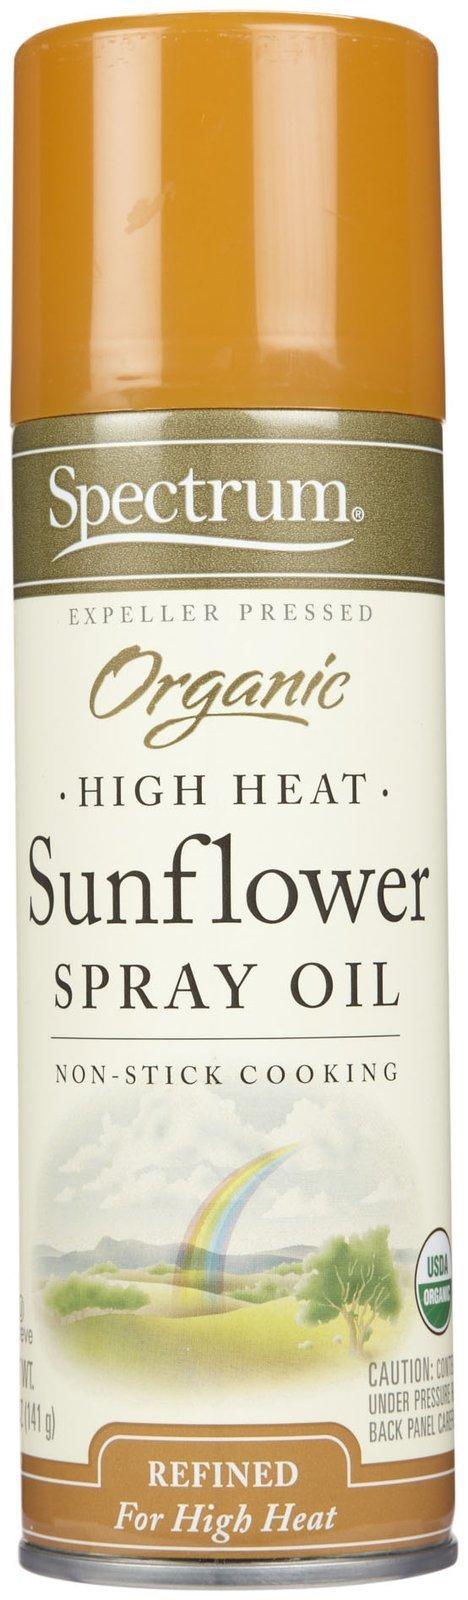 Spectrum Naturals Organic Sunflower Oil Spray, High Heat, 5 oz